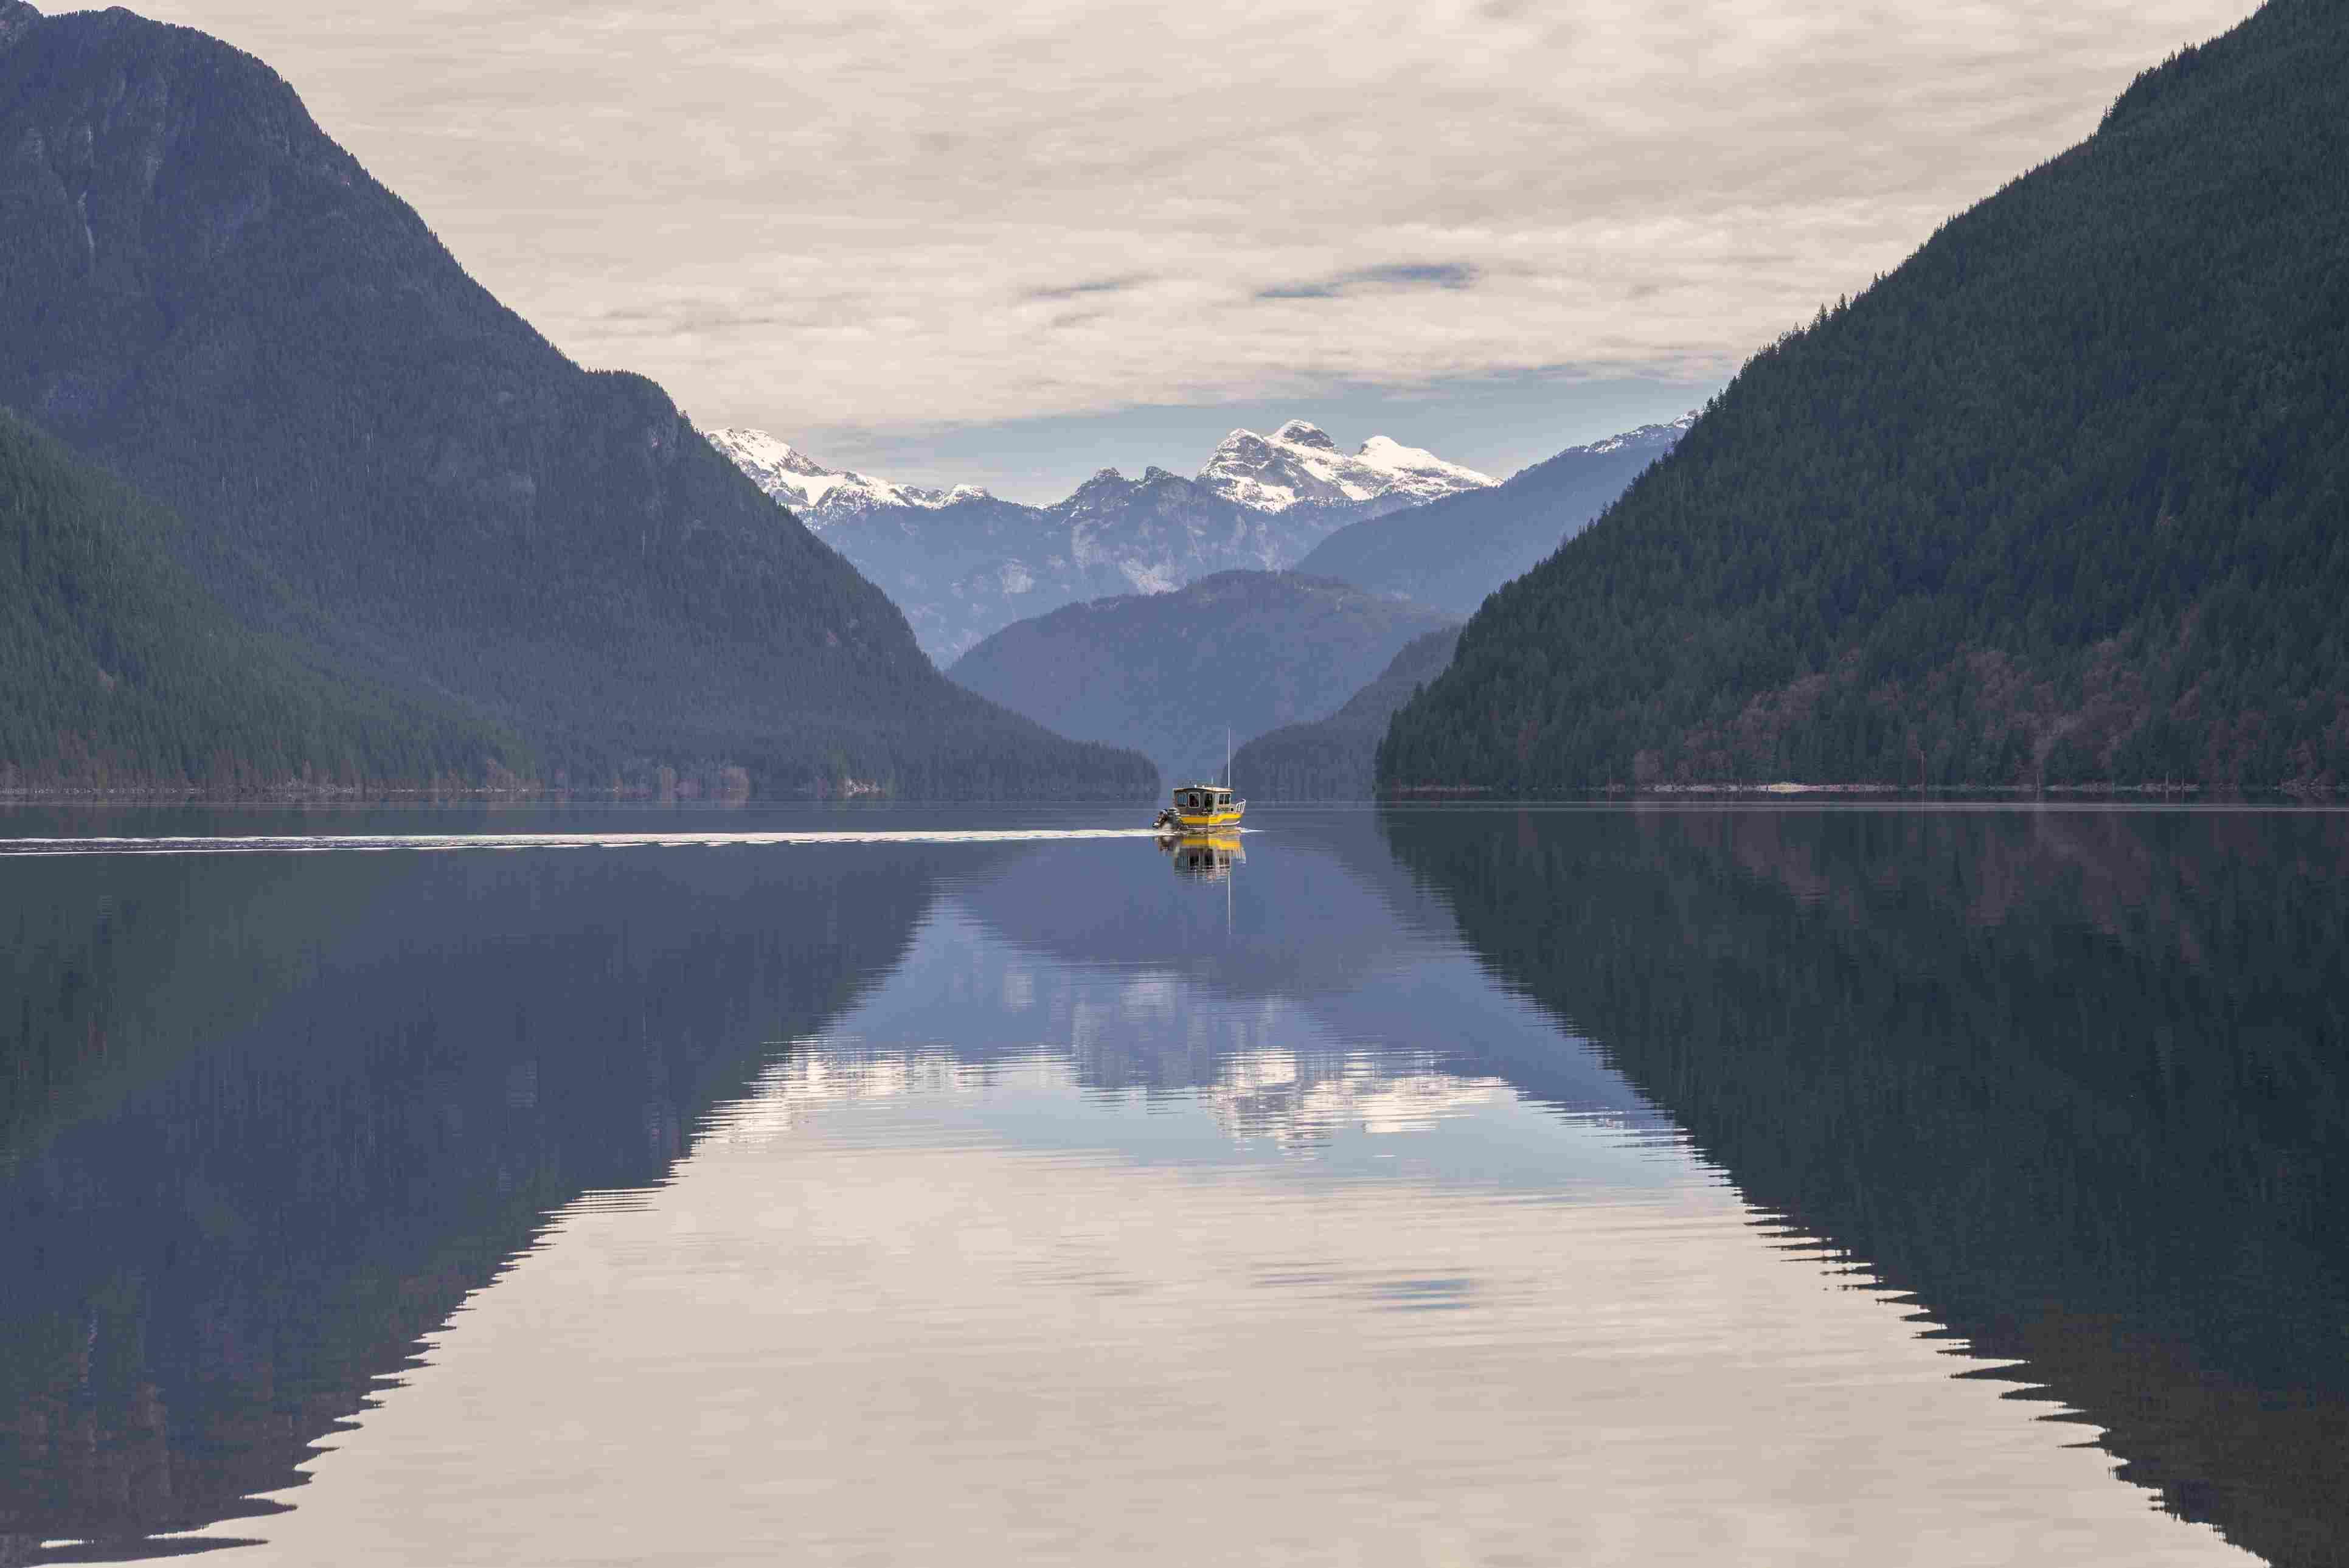 Boat on Alouette Lake in Golden Ears provincial park, Maple Ridge, British Columbia, Canada.